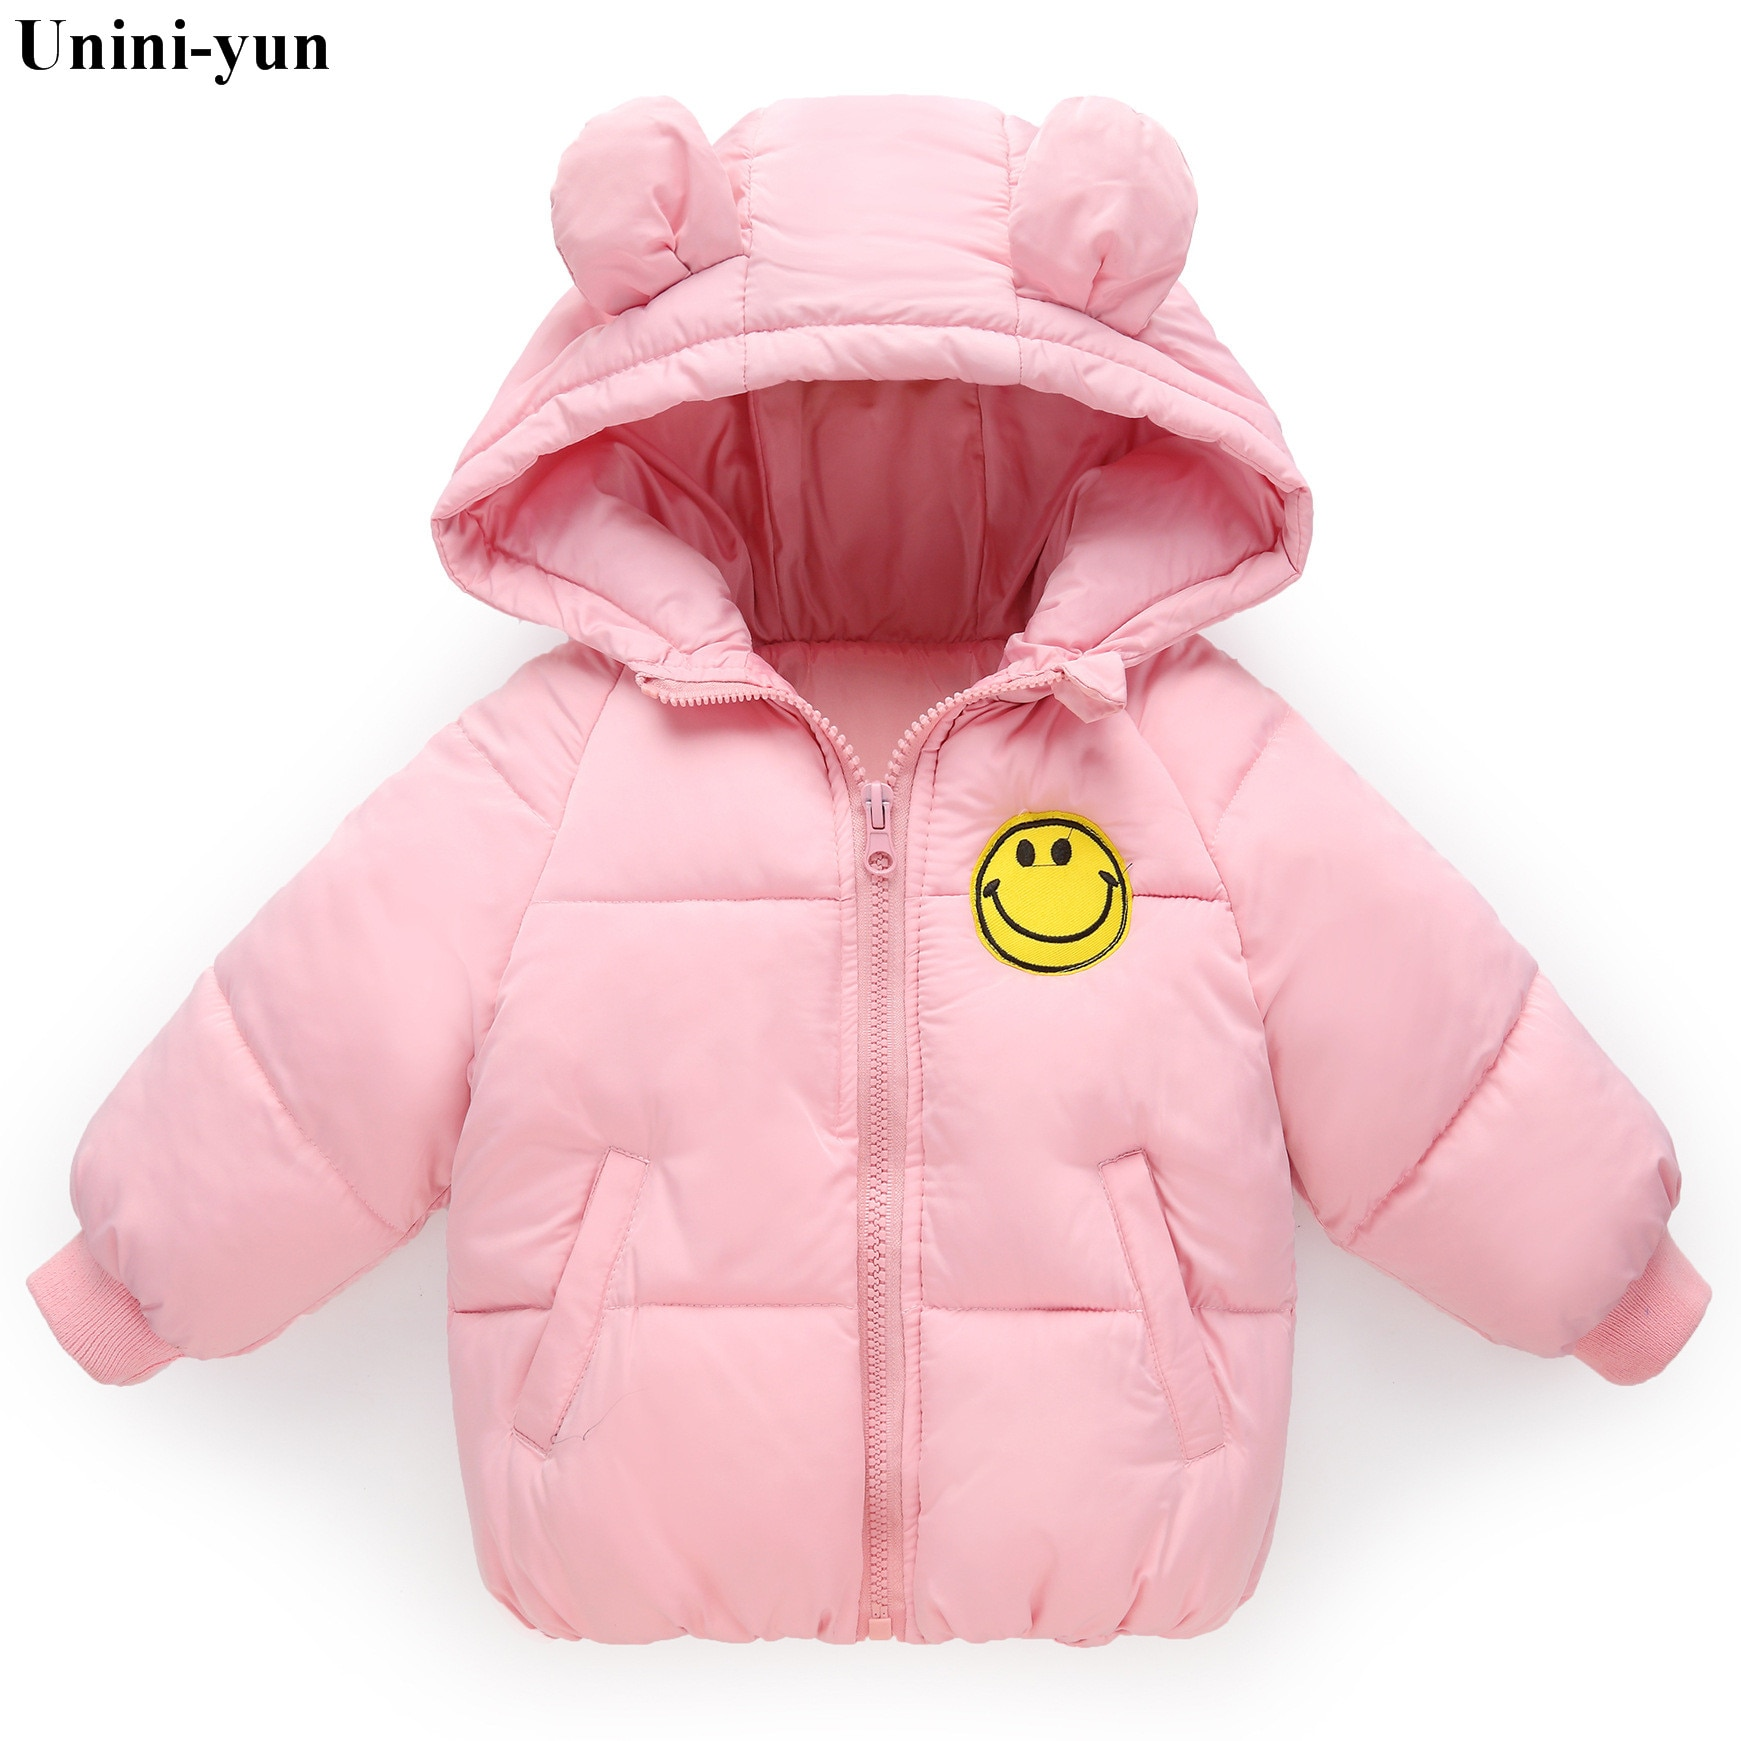 Chaqueta de invierno para niñas, chaqueta acolchada para niñas, chaqueta gruesa para niños, abrigo cálido para niños, parka para bebés, ropa acolchada de algodón